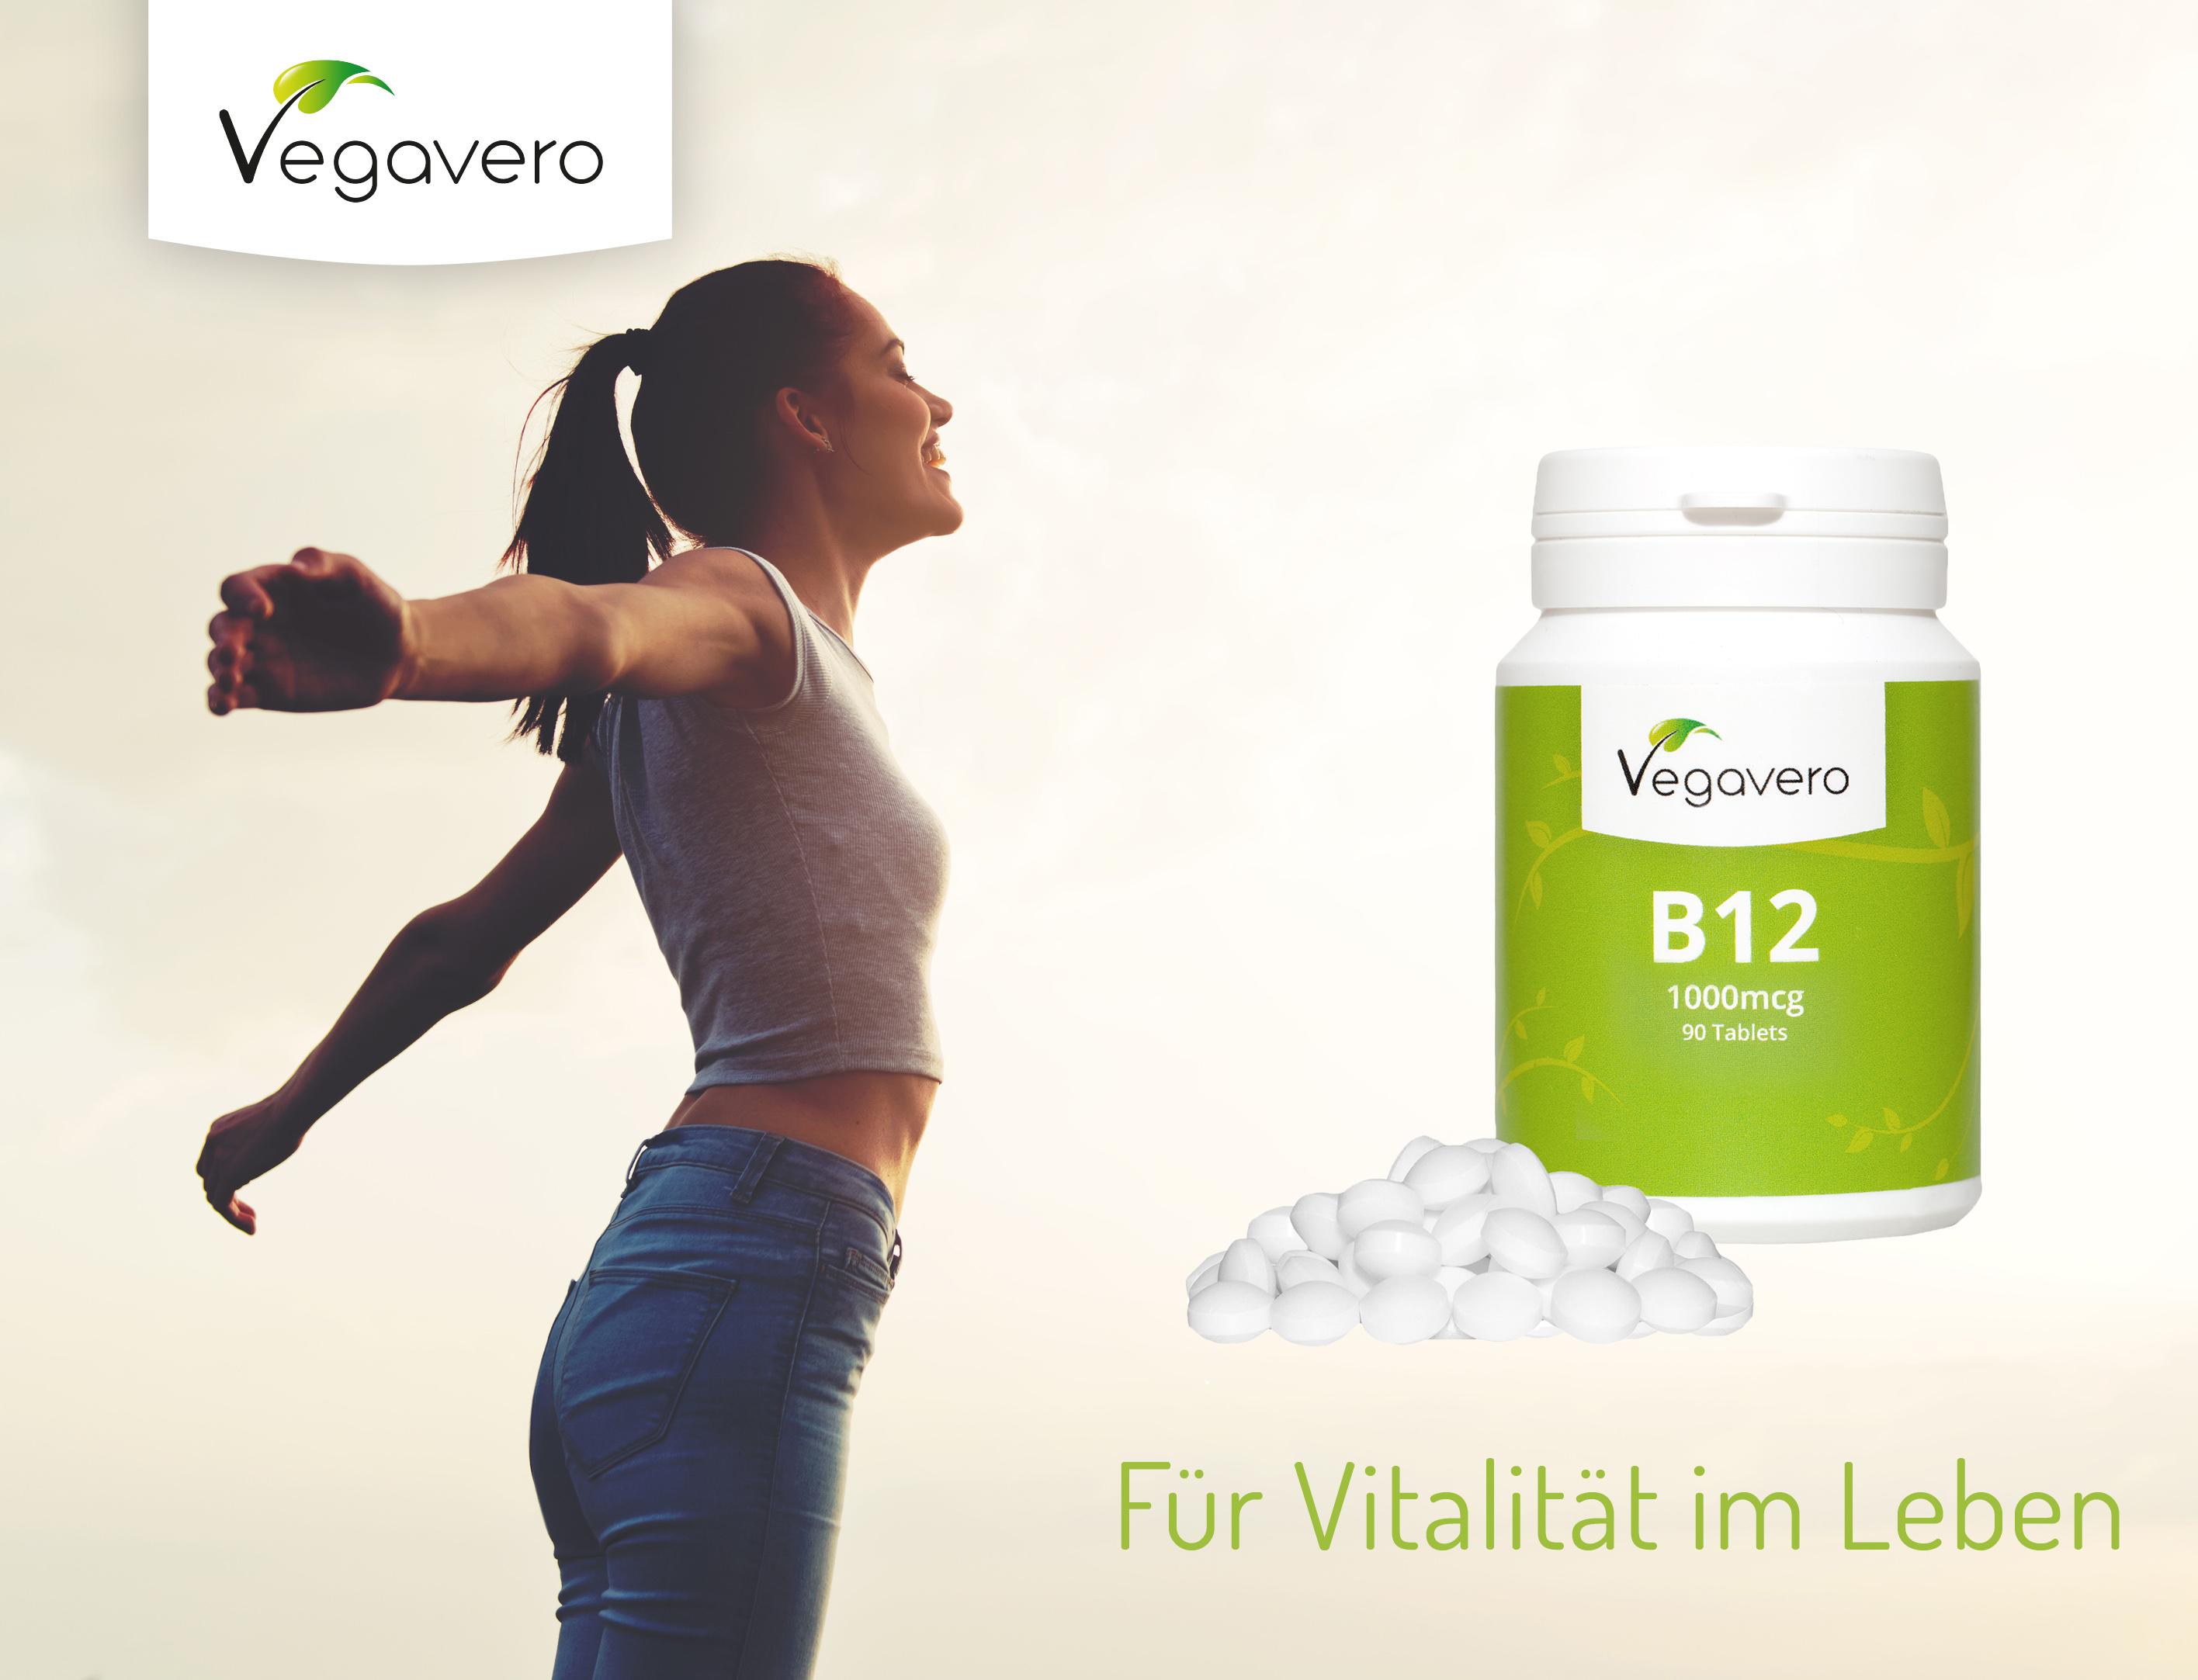 vitamin b12 1000 g testsieger b6 fols ure methylcobalamin vegan 3 monatsvorrat ebay. Black Bedroom Furniture Sets. Home Design Ideas